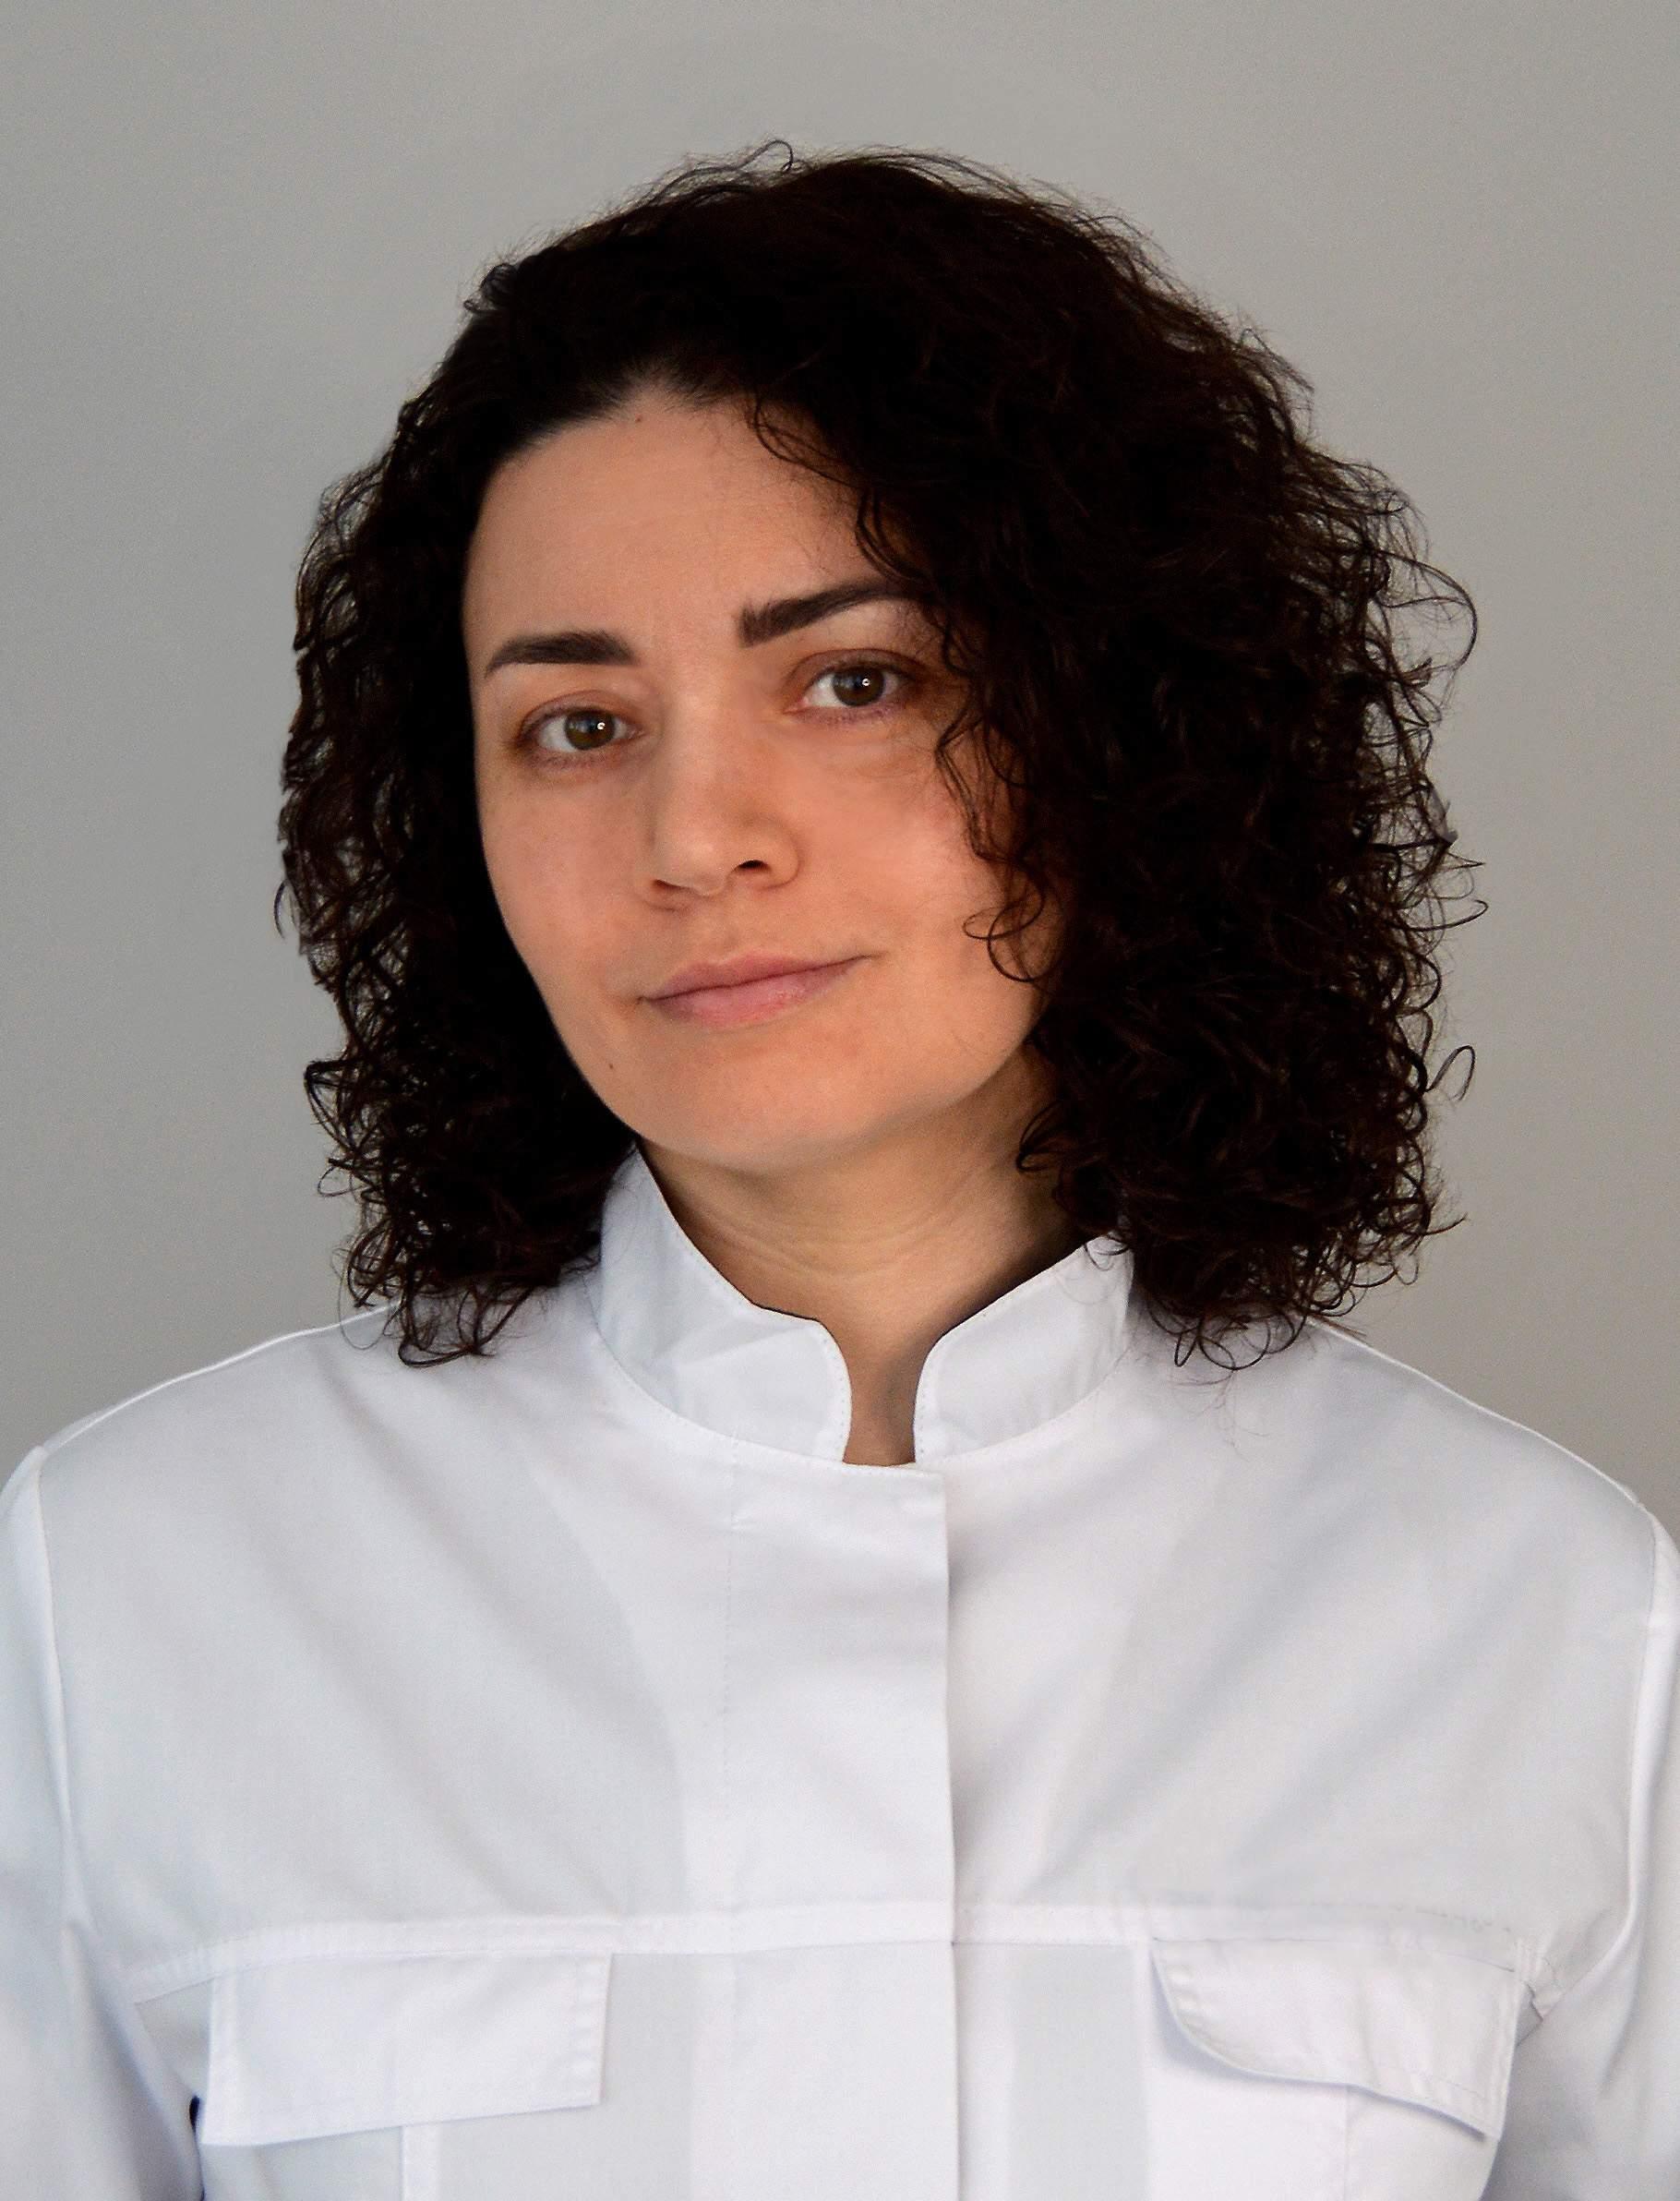 Абрицова Марьяна Владимировна